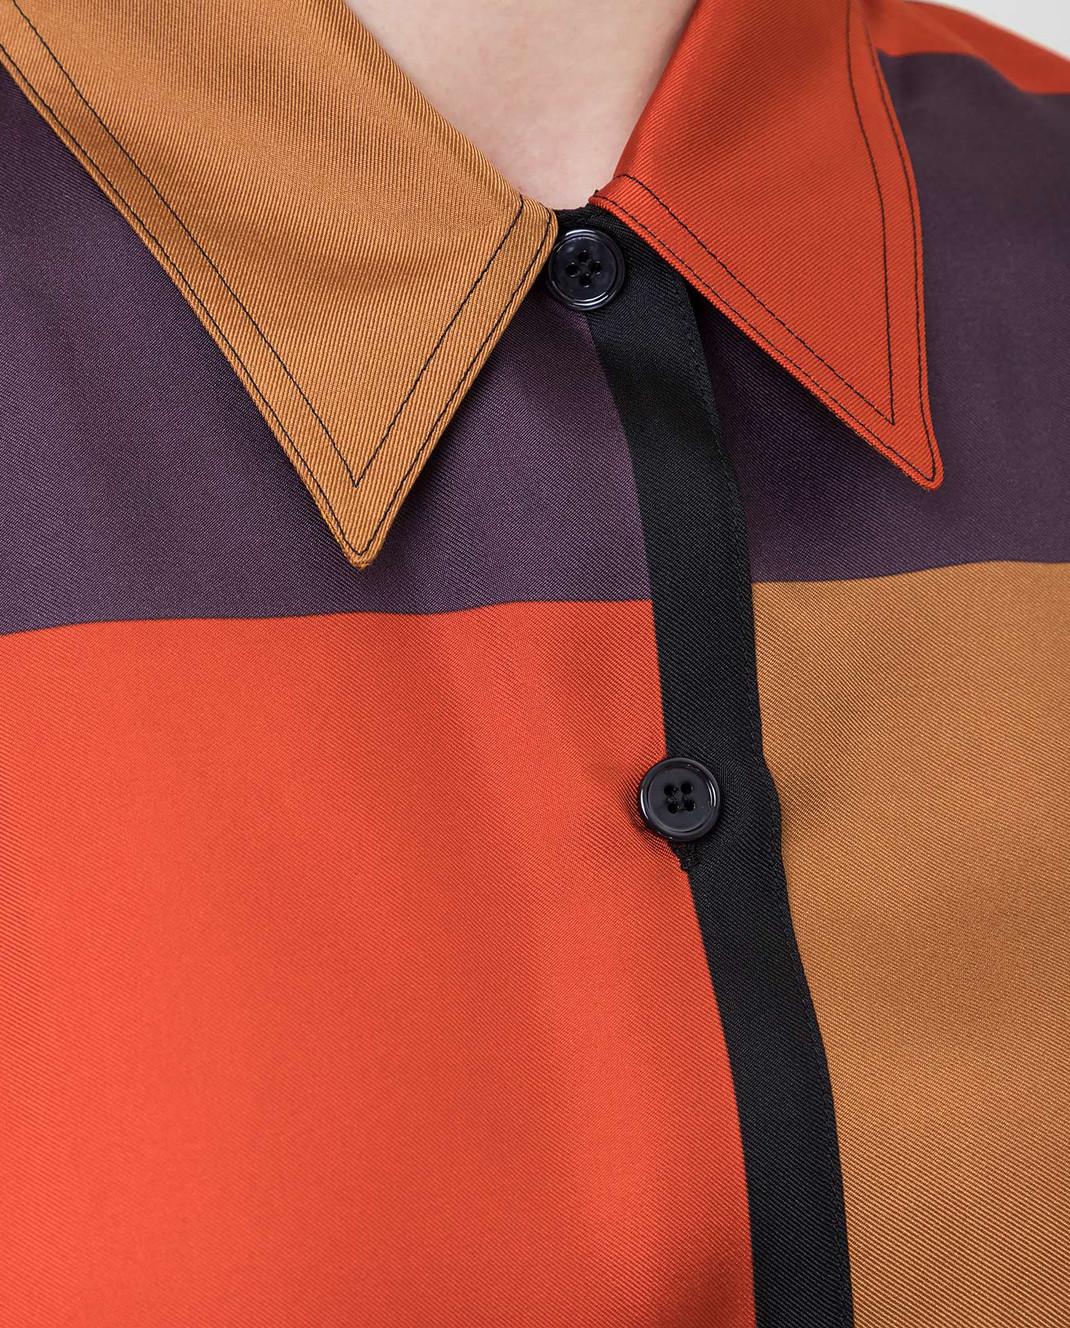 Bottega Veneta Коричневая рубашка из шелка 538599 изображение 5